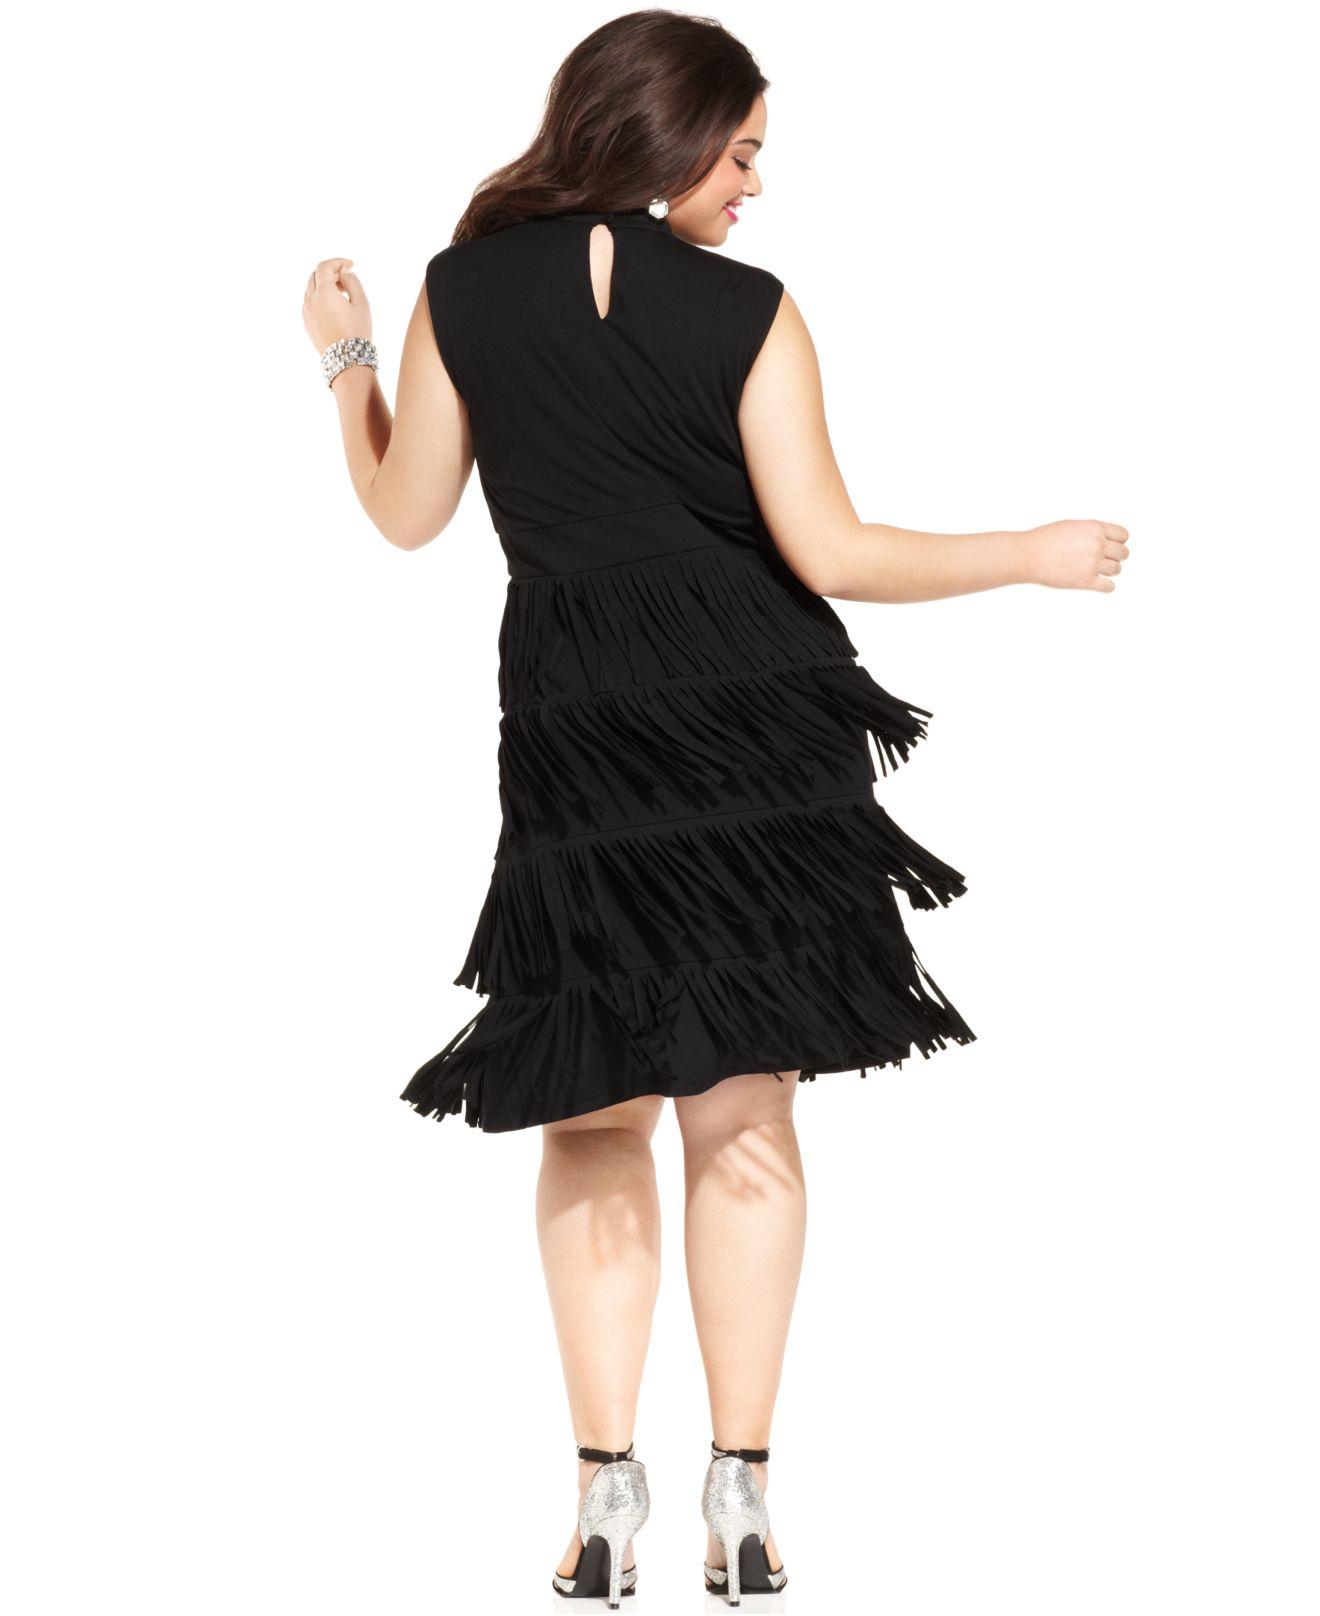 Spense Plus Size Tiered Fringe Dress in Black | Lyst